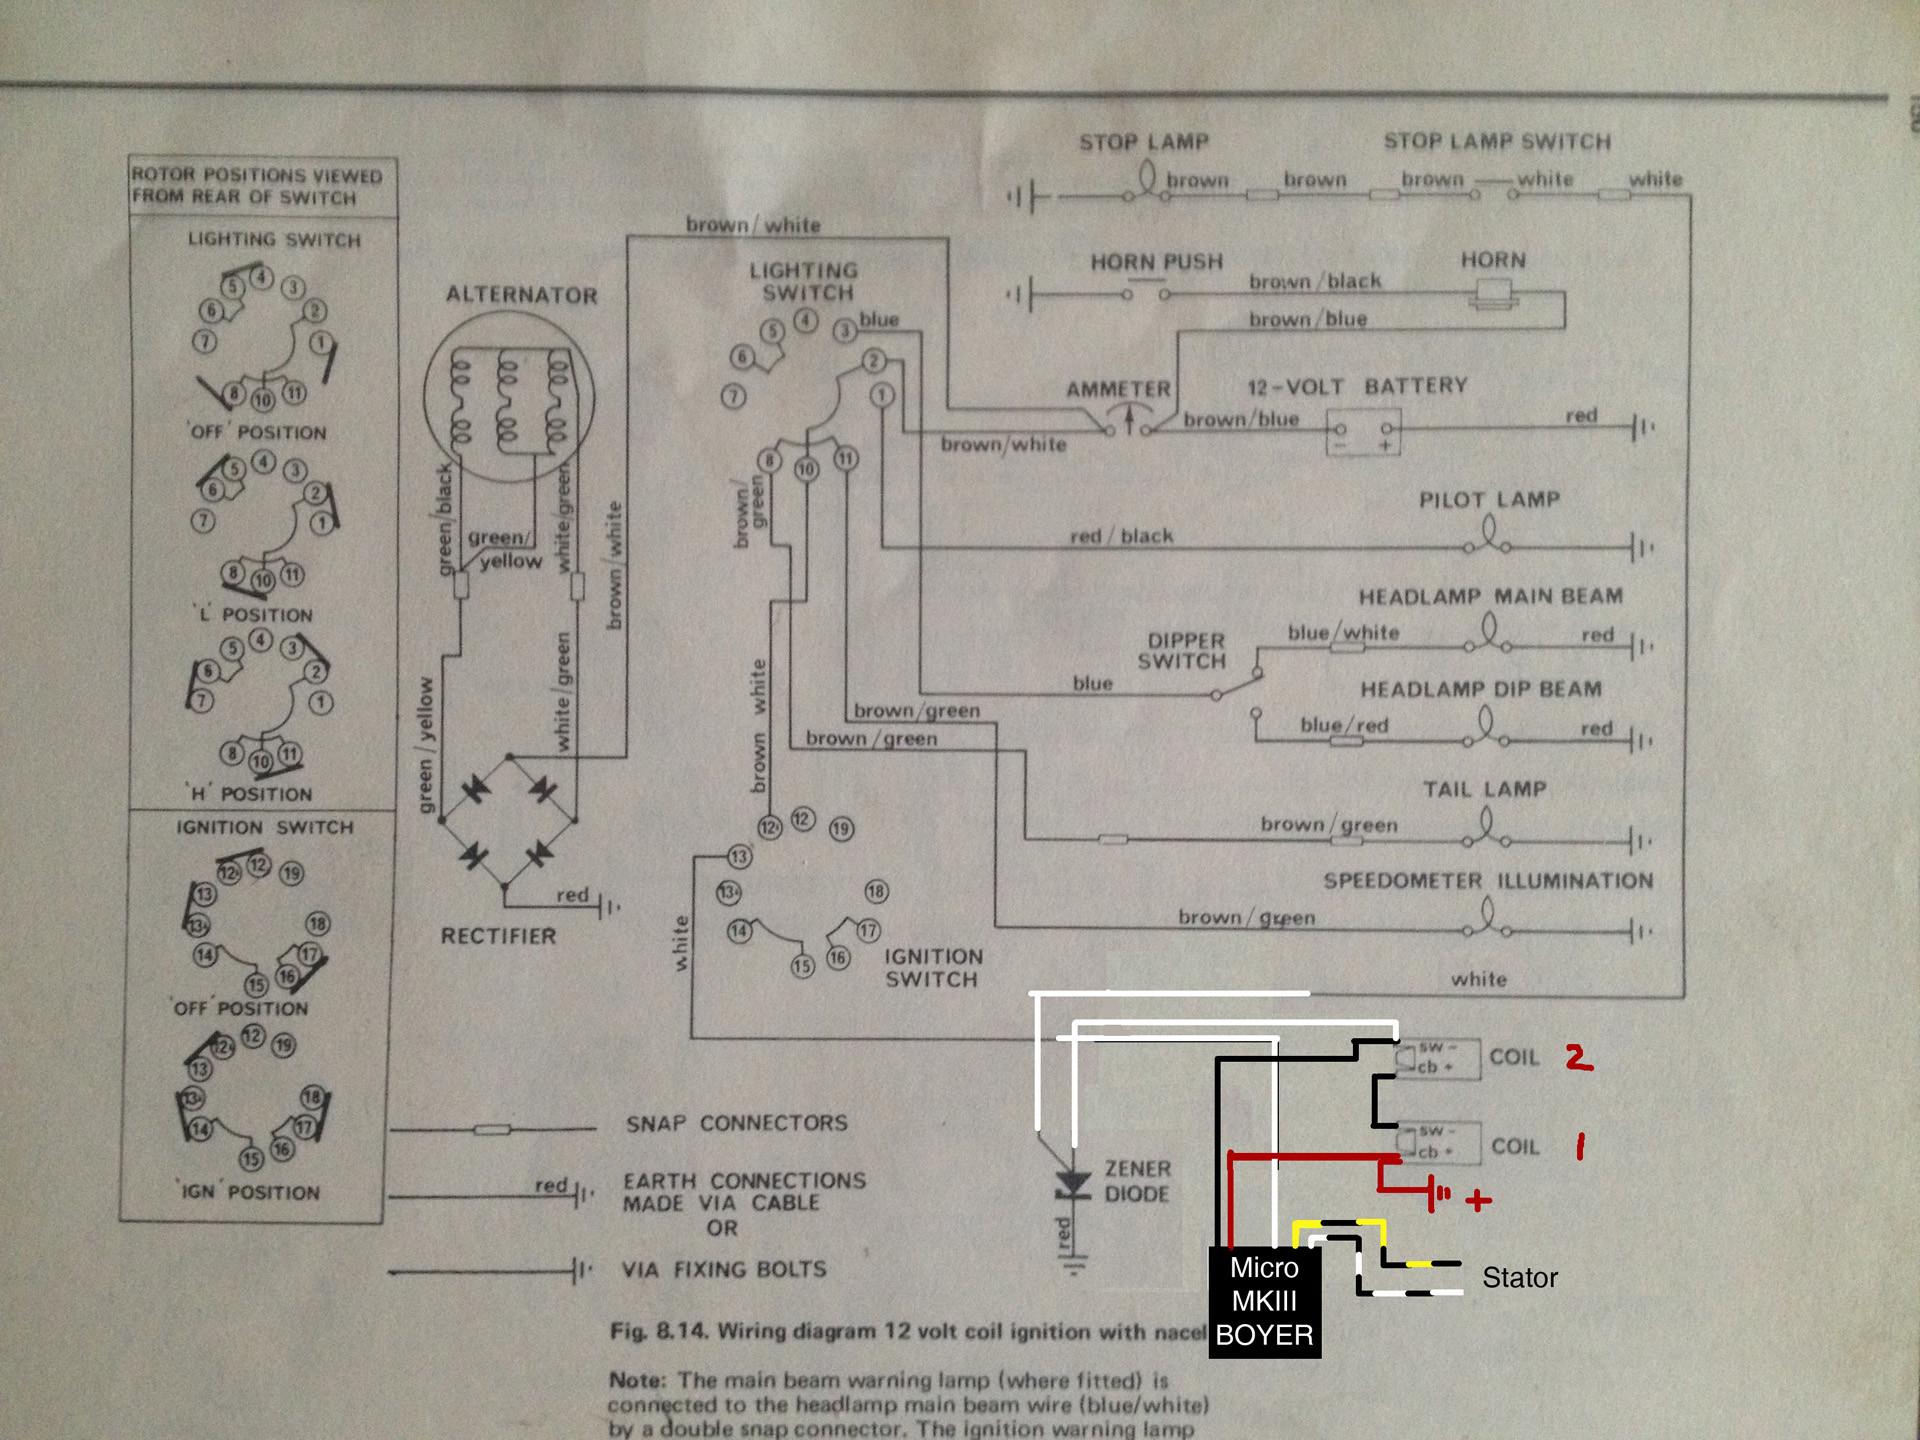 RF_2947] 1971 Triumph T120 Wiring Diagram Schematic WiringFlui Lline Jebrp Dome Mohammedshrine Librar Wiring 101